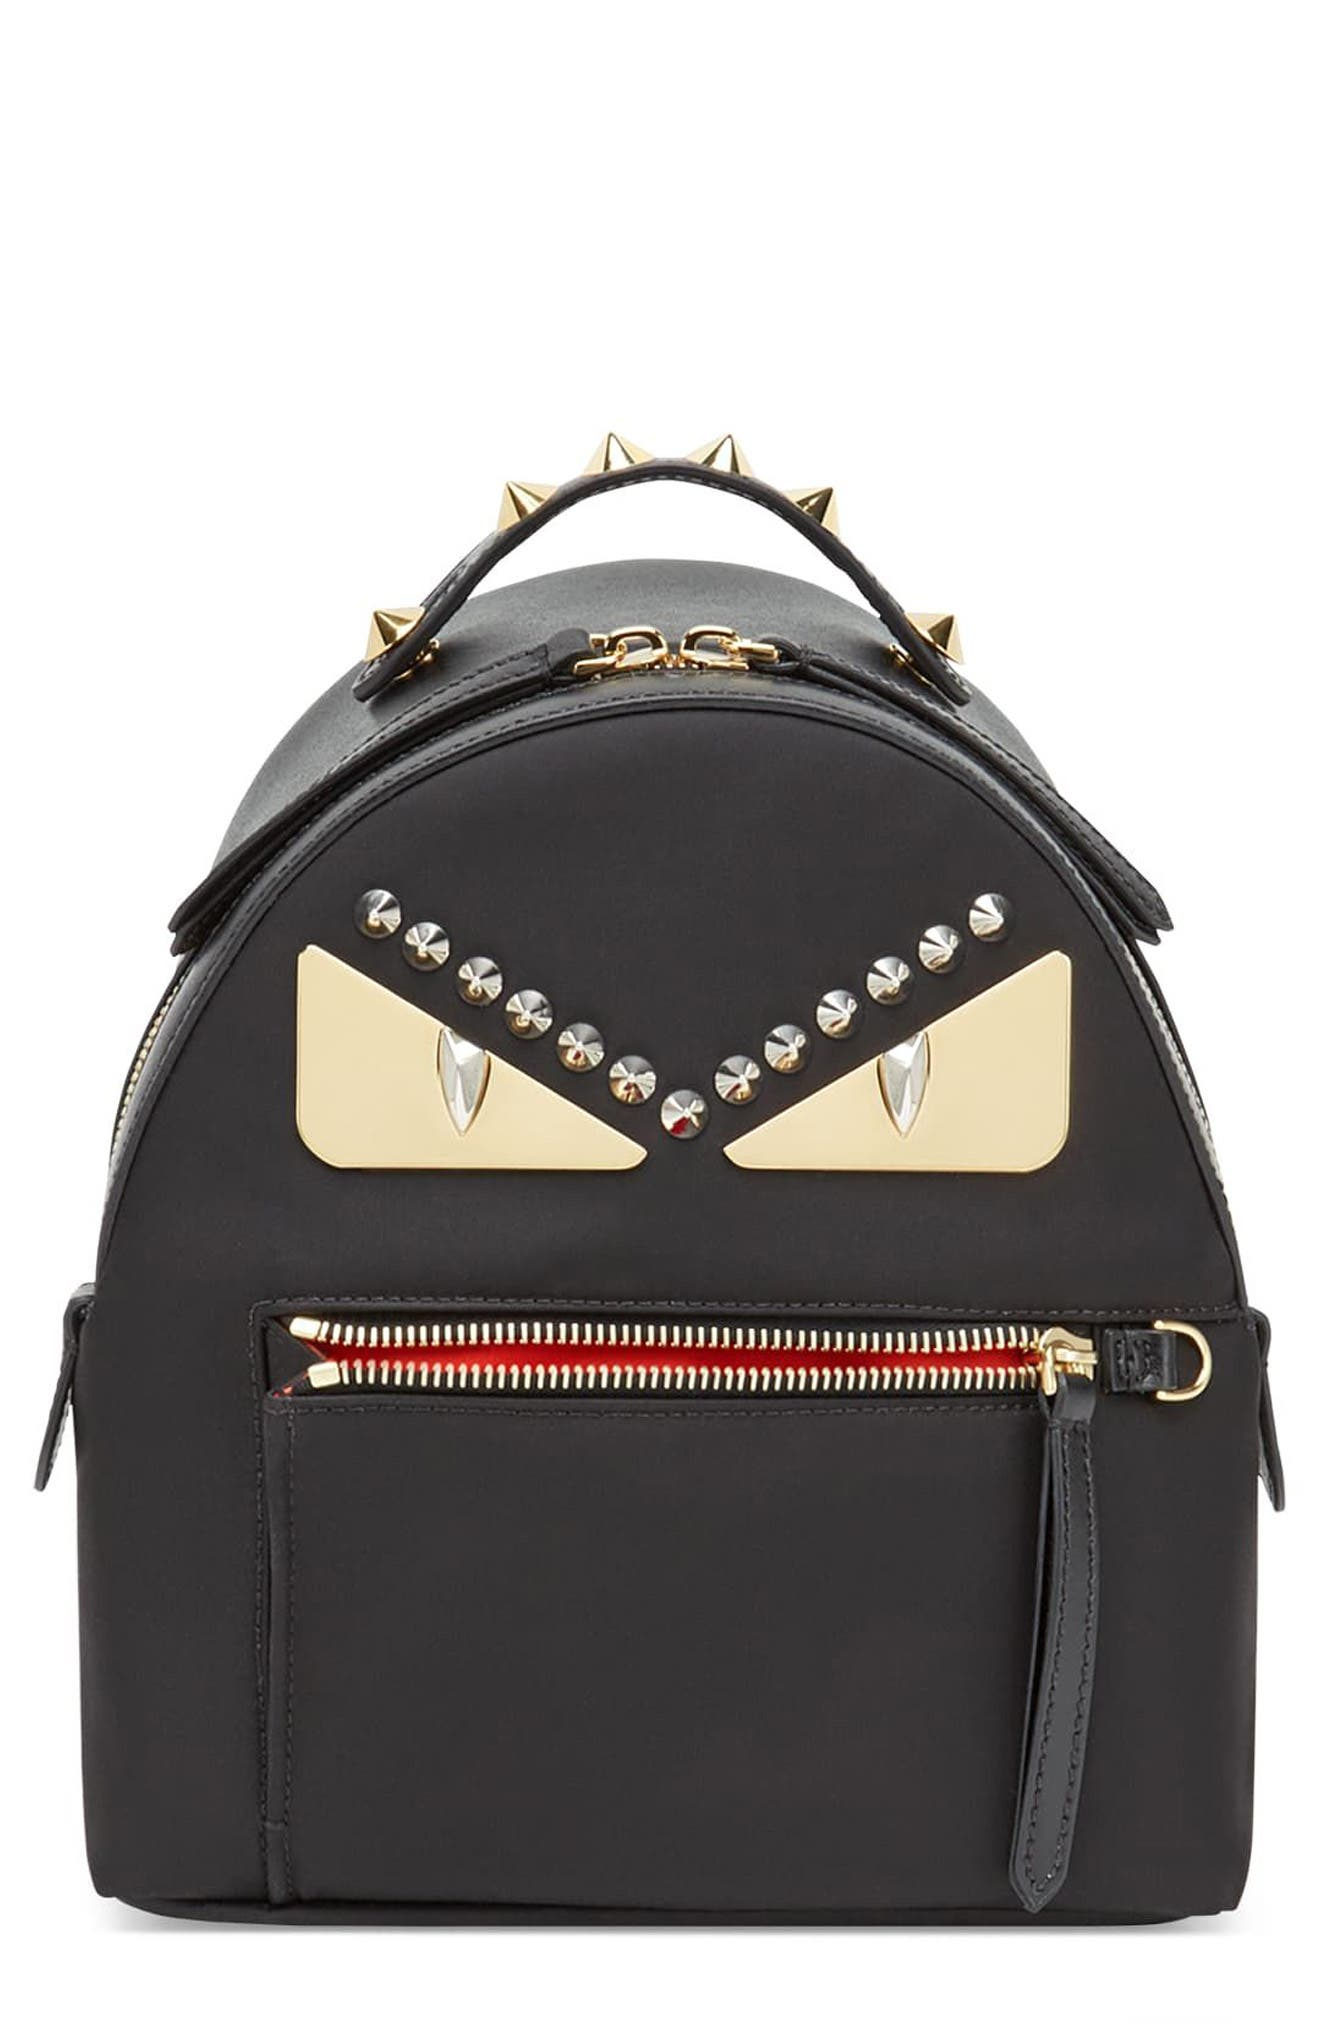 Mini Monster Nylon Backpack,                         Main,                         color, Nero/ Oro Soft